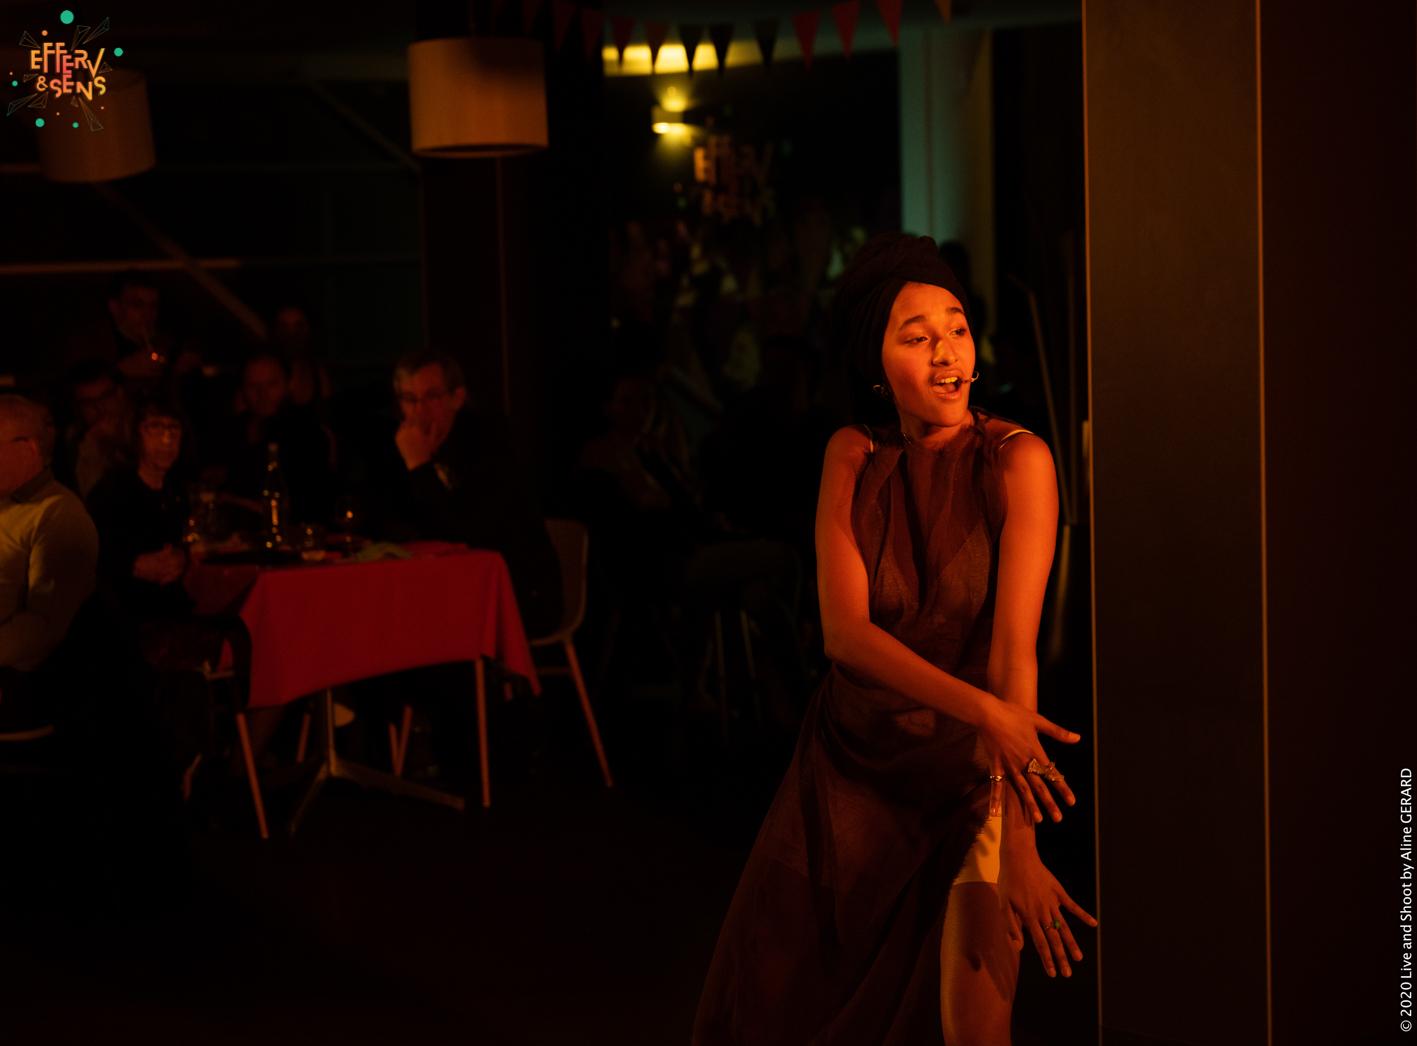 Daena Ladeesse_Prestation musicale Cabaret des Curiosités_Efferv&Sens à Poitiers